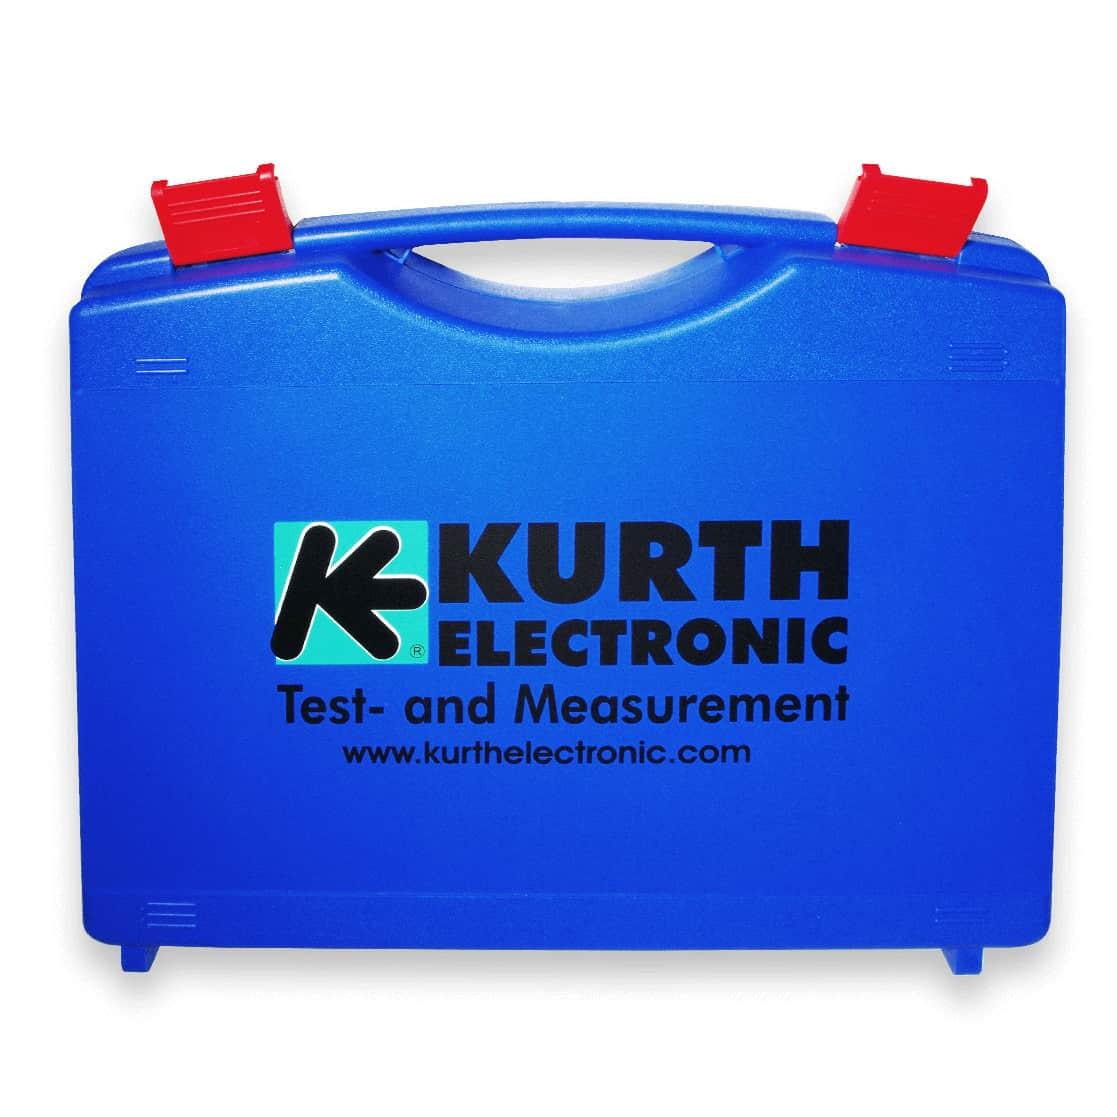 Kurth Electronic Gerätekoffer blau